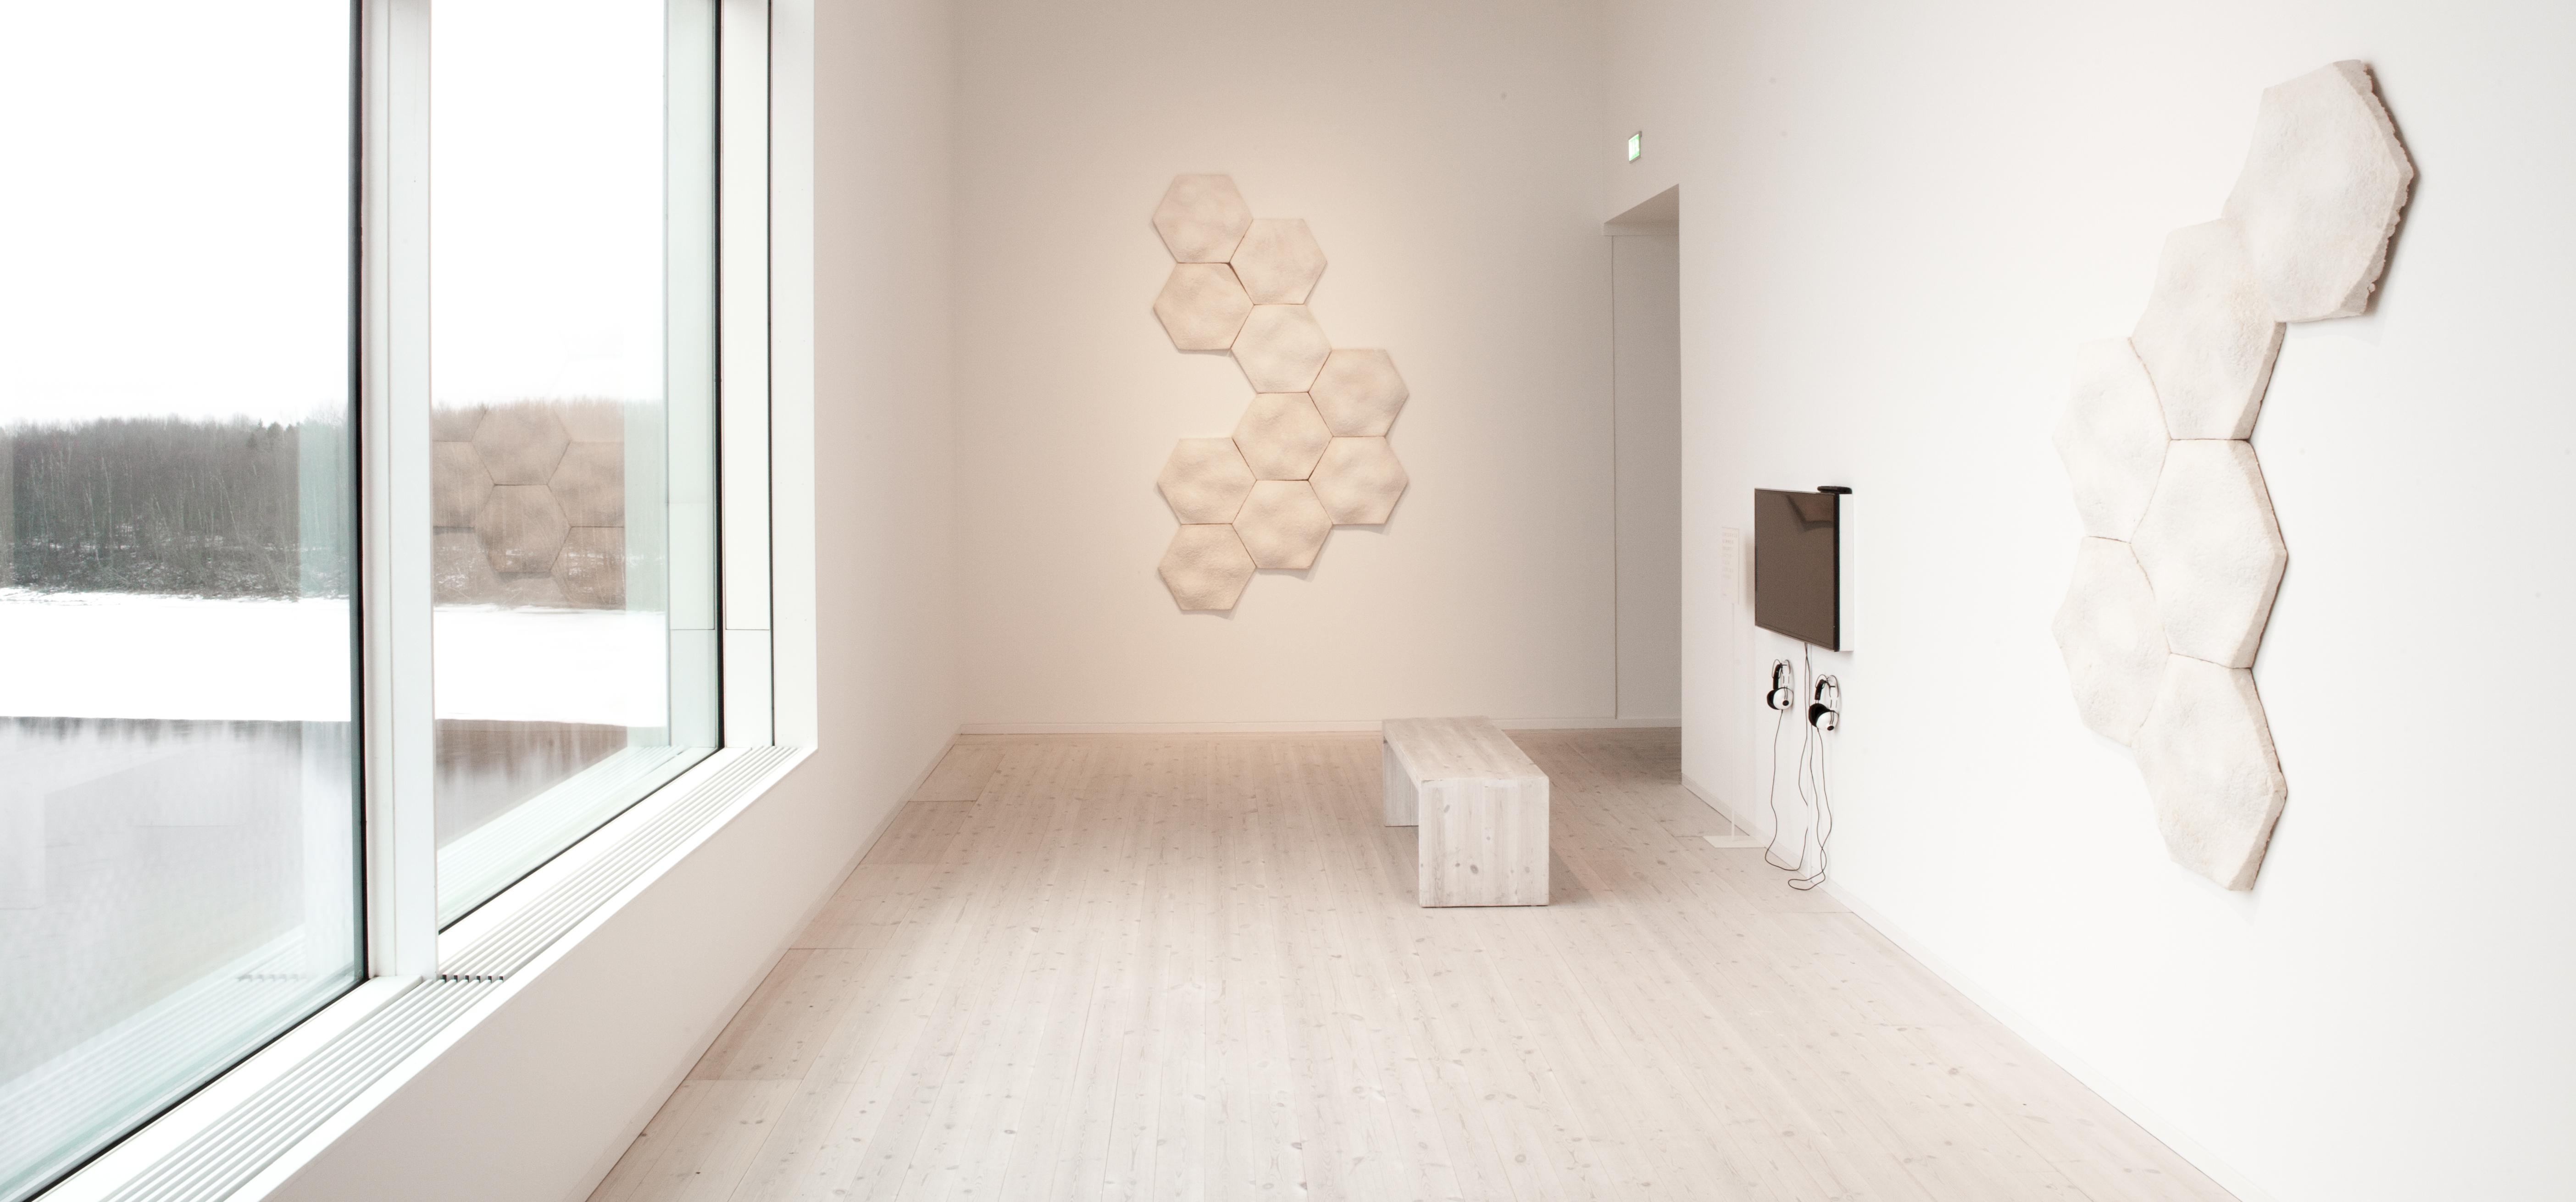 DESIGN MATTERS //  Bildmuseet Umea University – 15.11.2019 – 12.04.2020 // Umea (S) / Exhibition